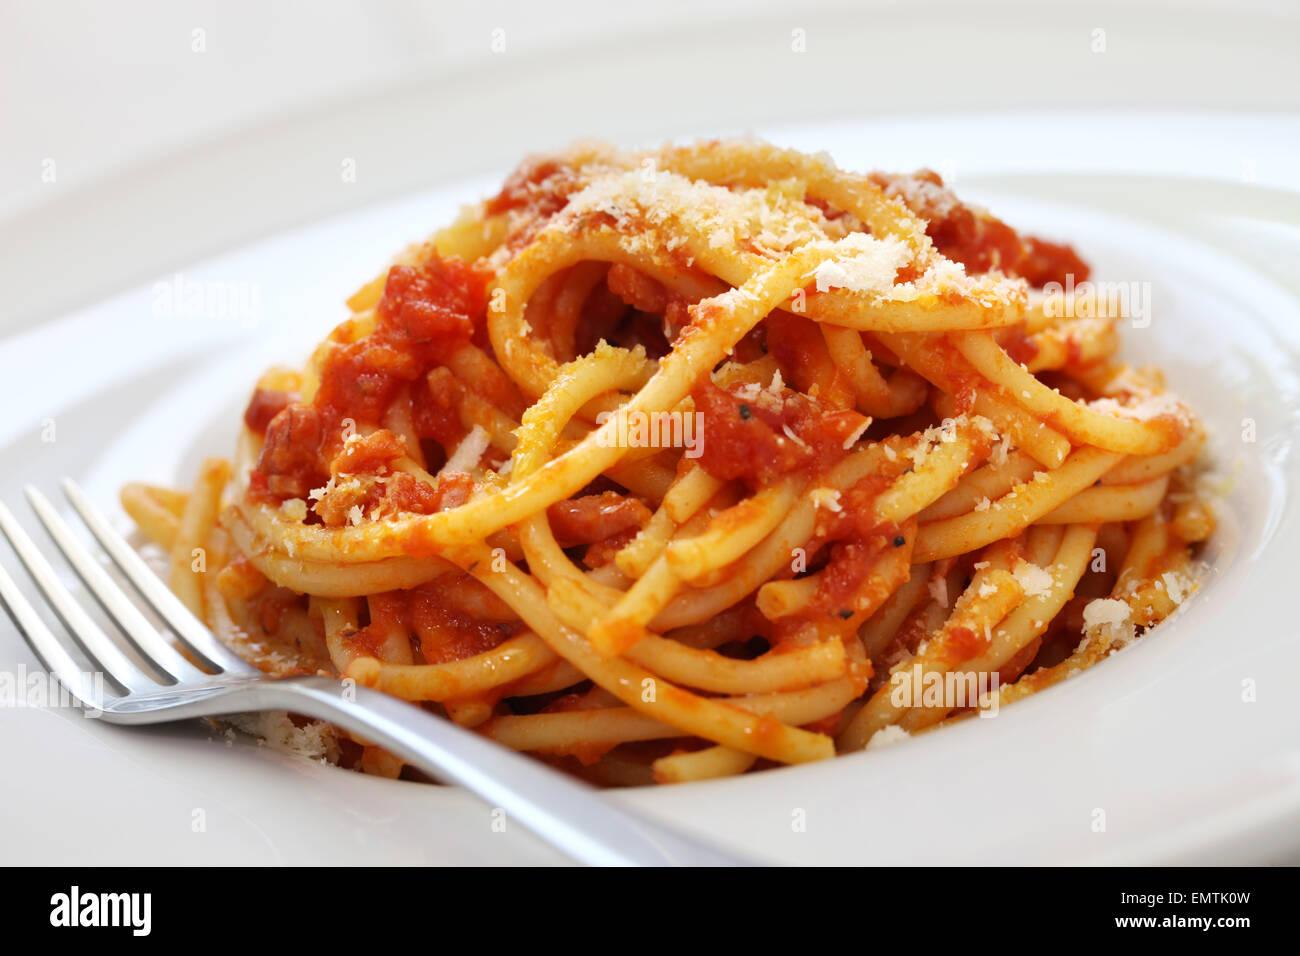 L'amatriciana bucatini alla, pâtes sauce tomate italienne Photo Stock